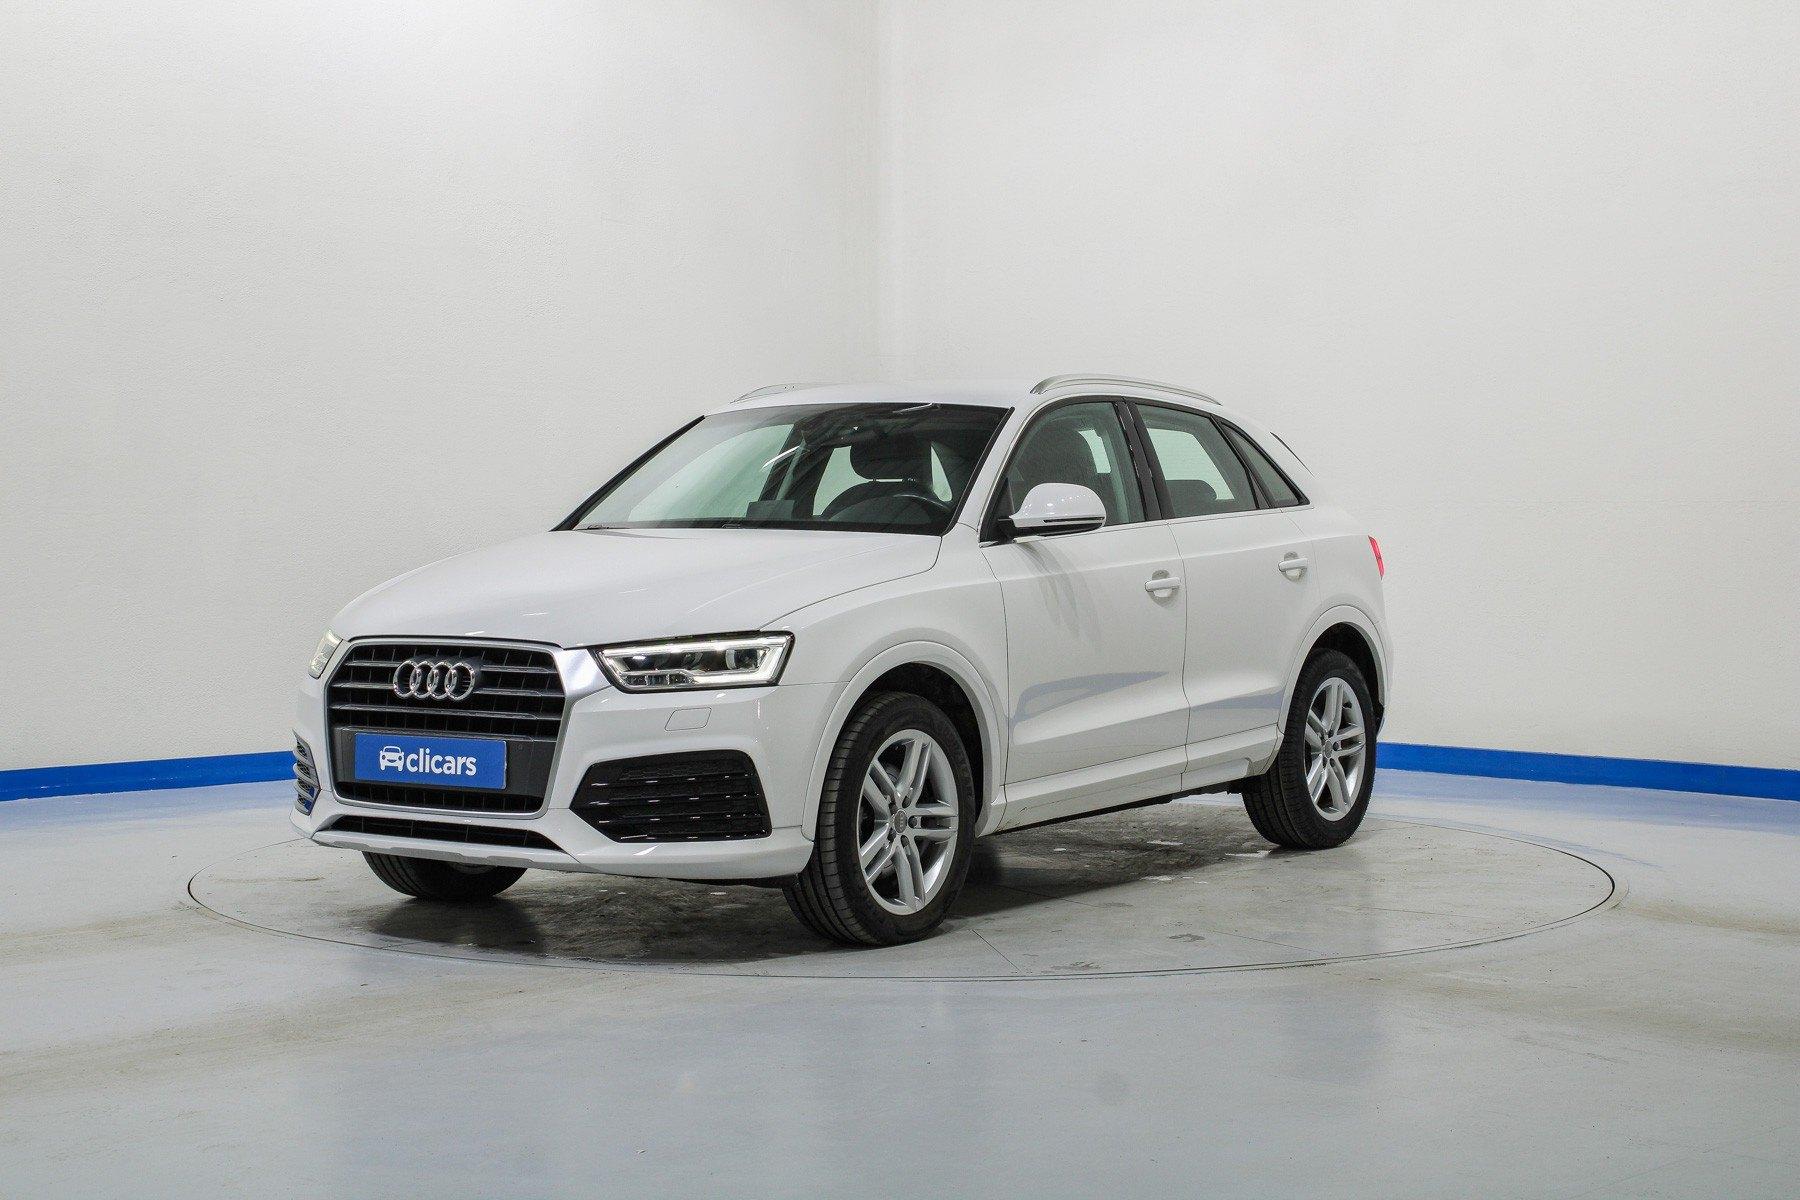 Audi Q3 Gasolina 1.4 TFSI 110kW (150CV) ultra CoD 1